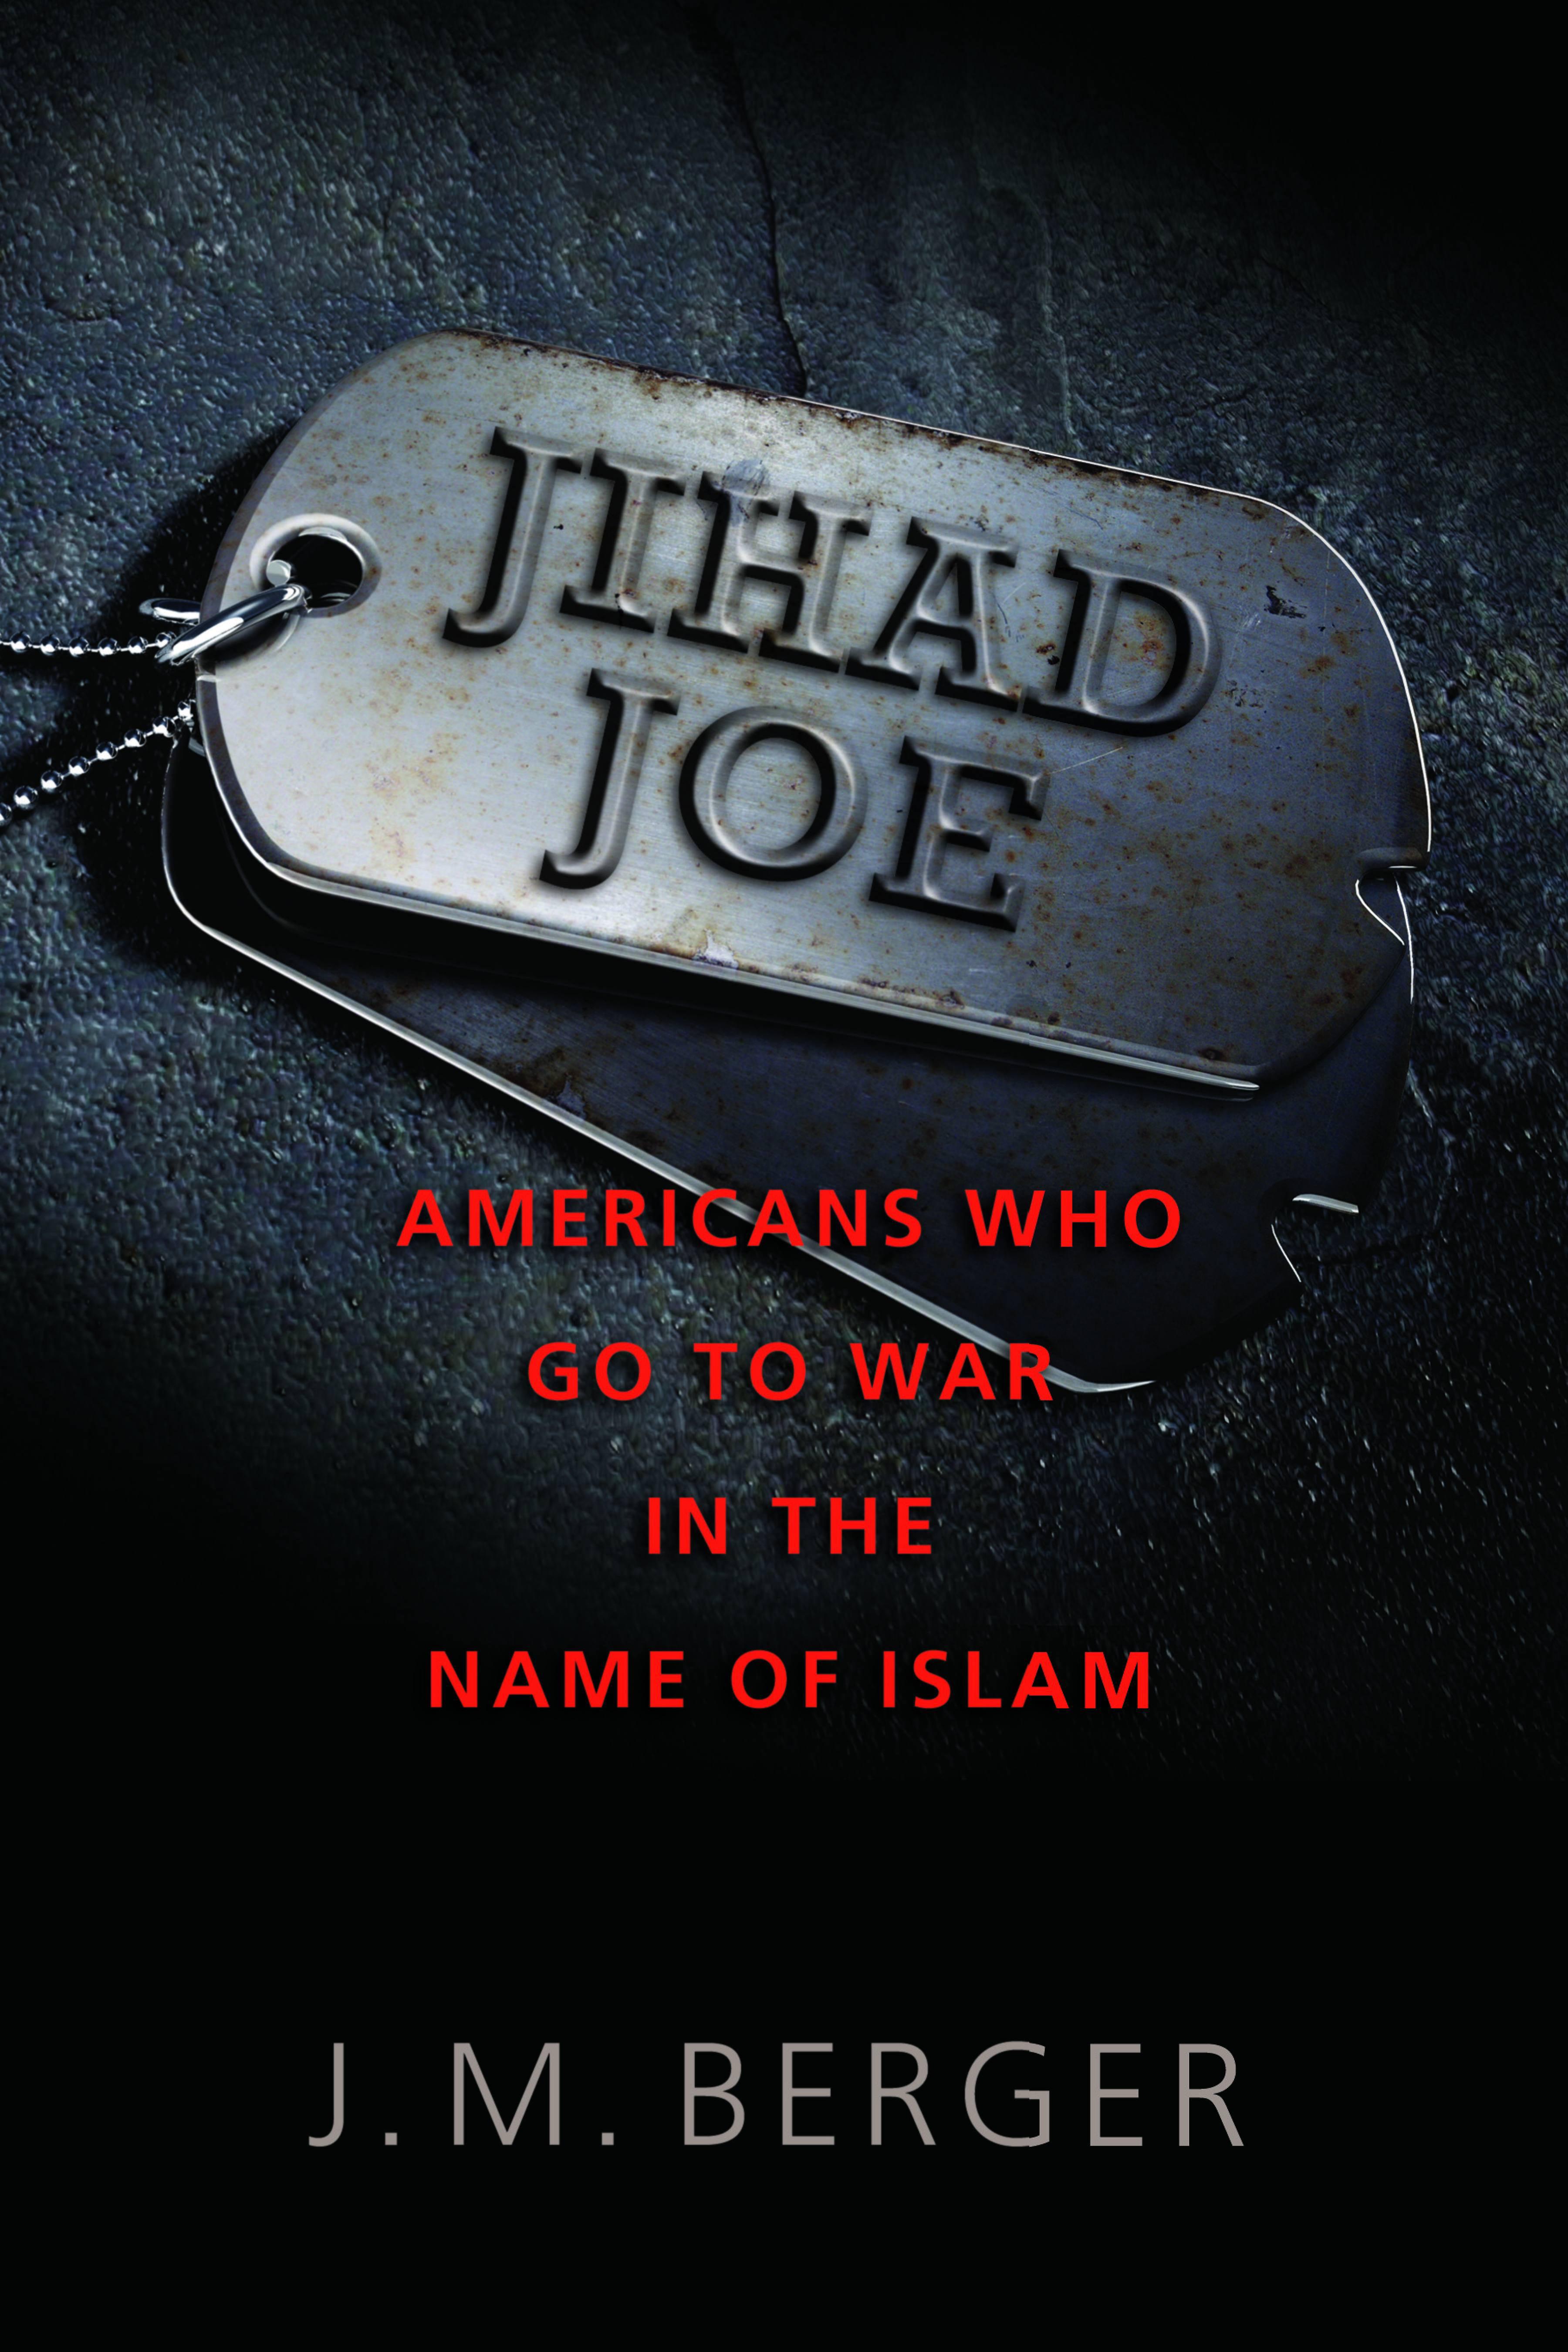 Jihad Joe : Americans Who Go to War in the Name of Islam